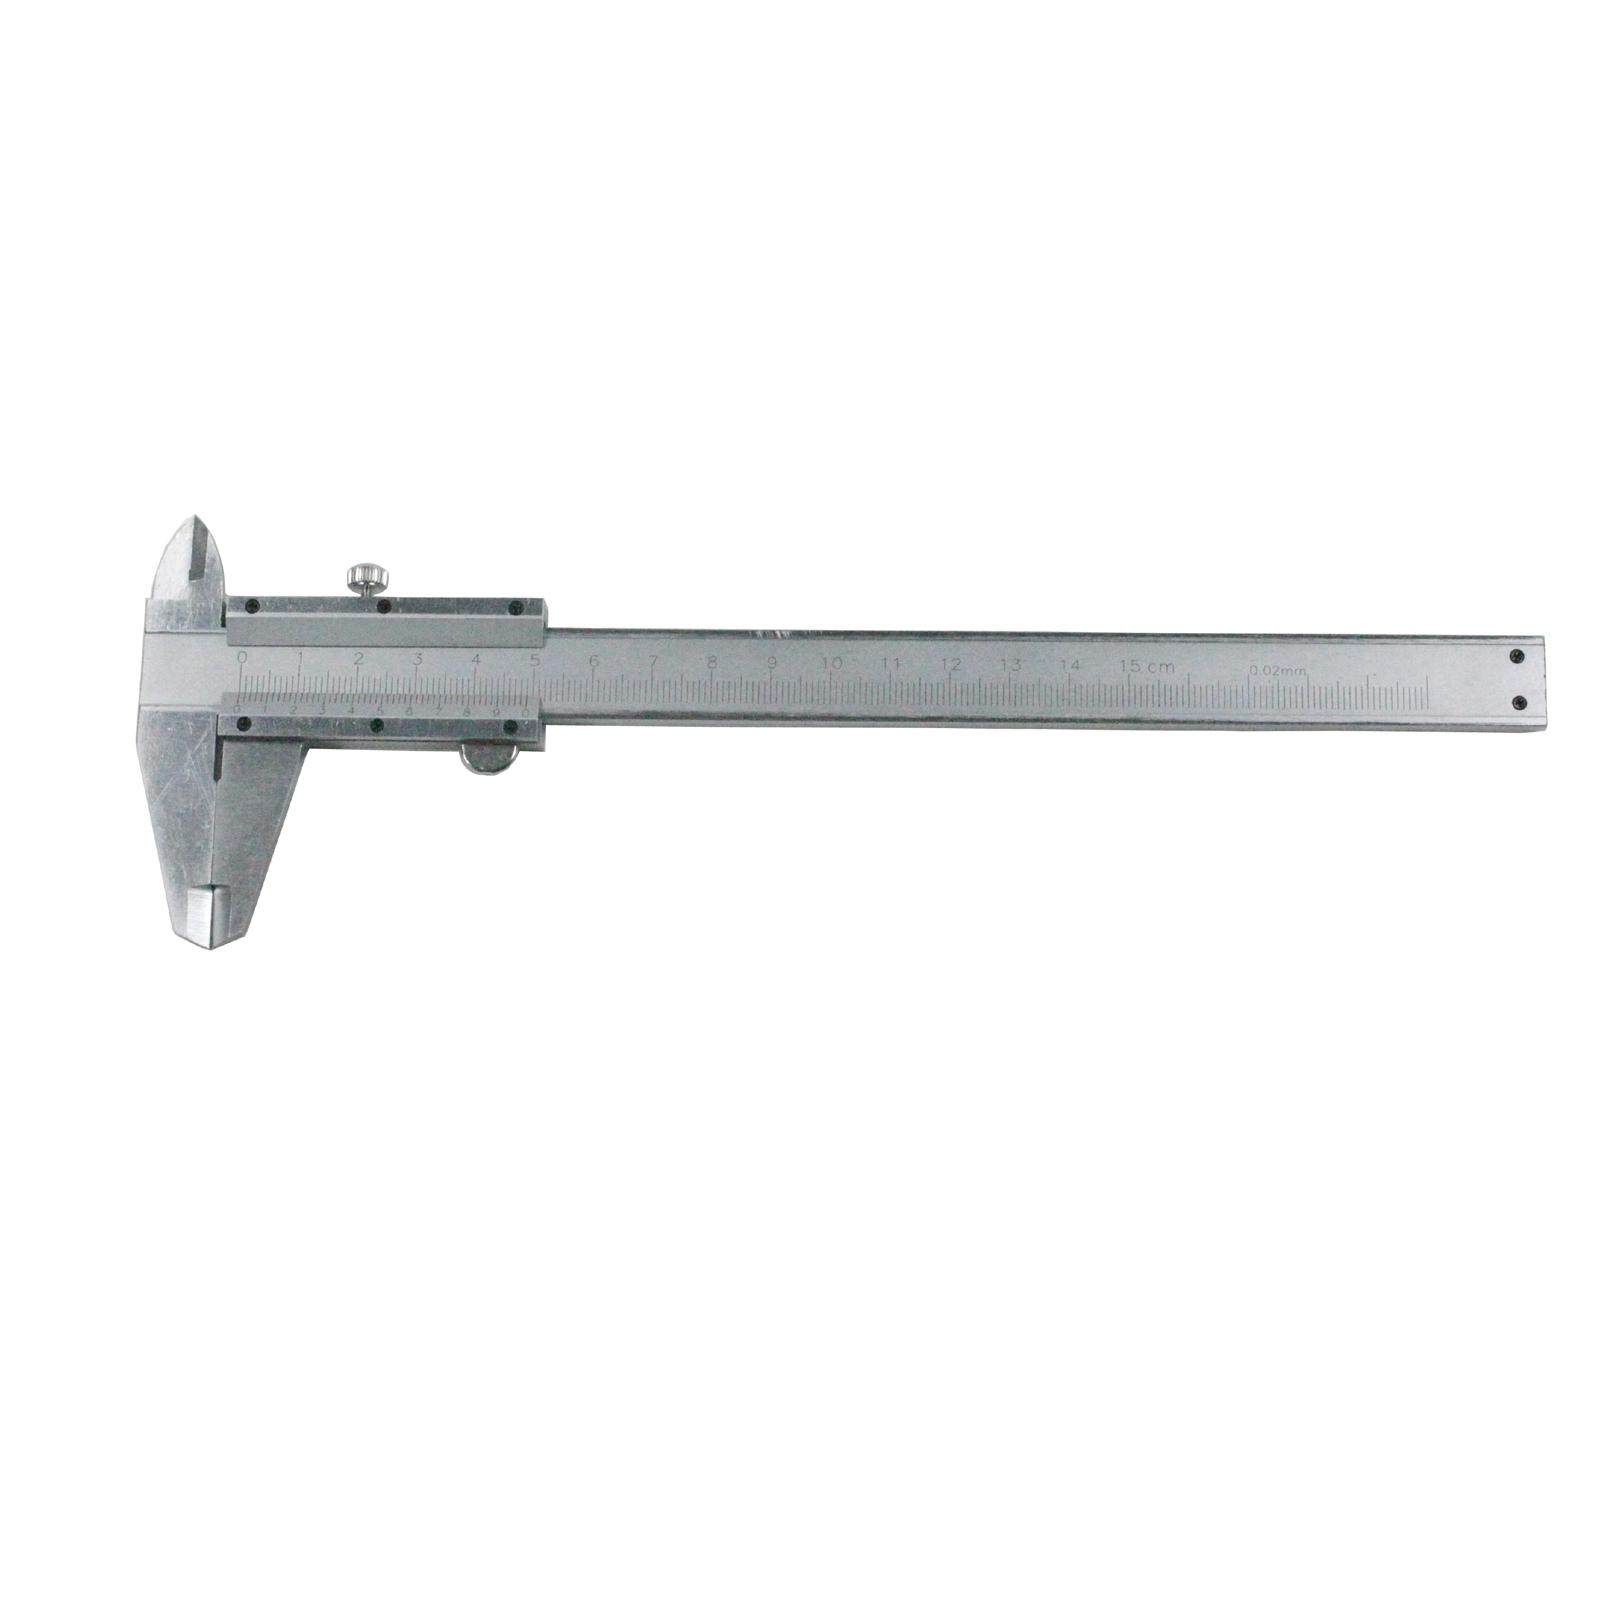 Craftright 150mm Metric Vernier Caliper